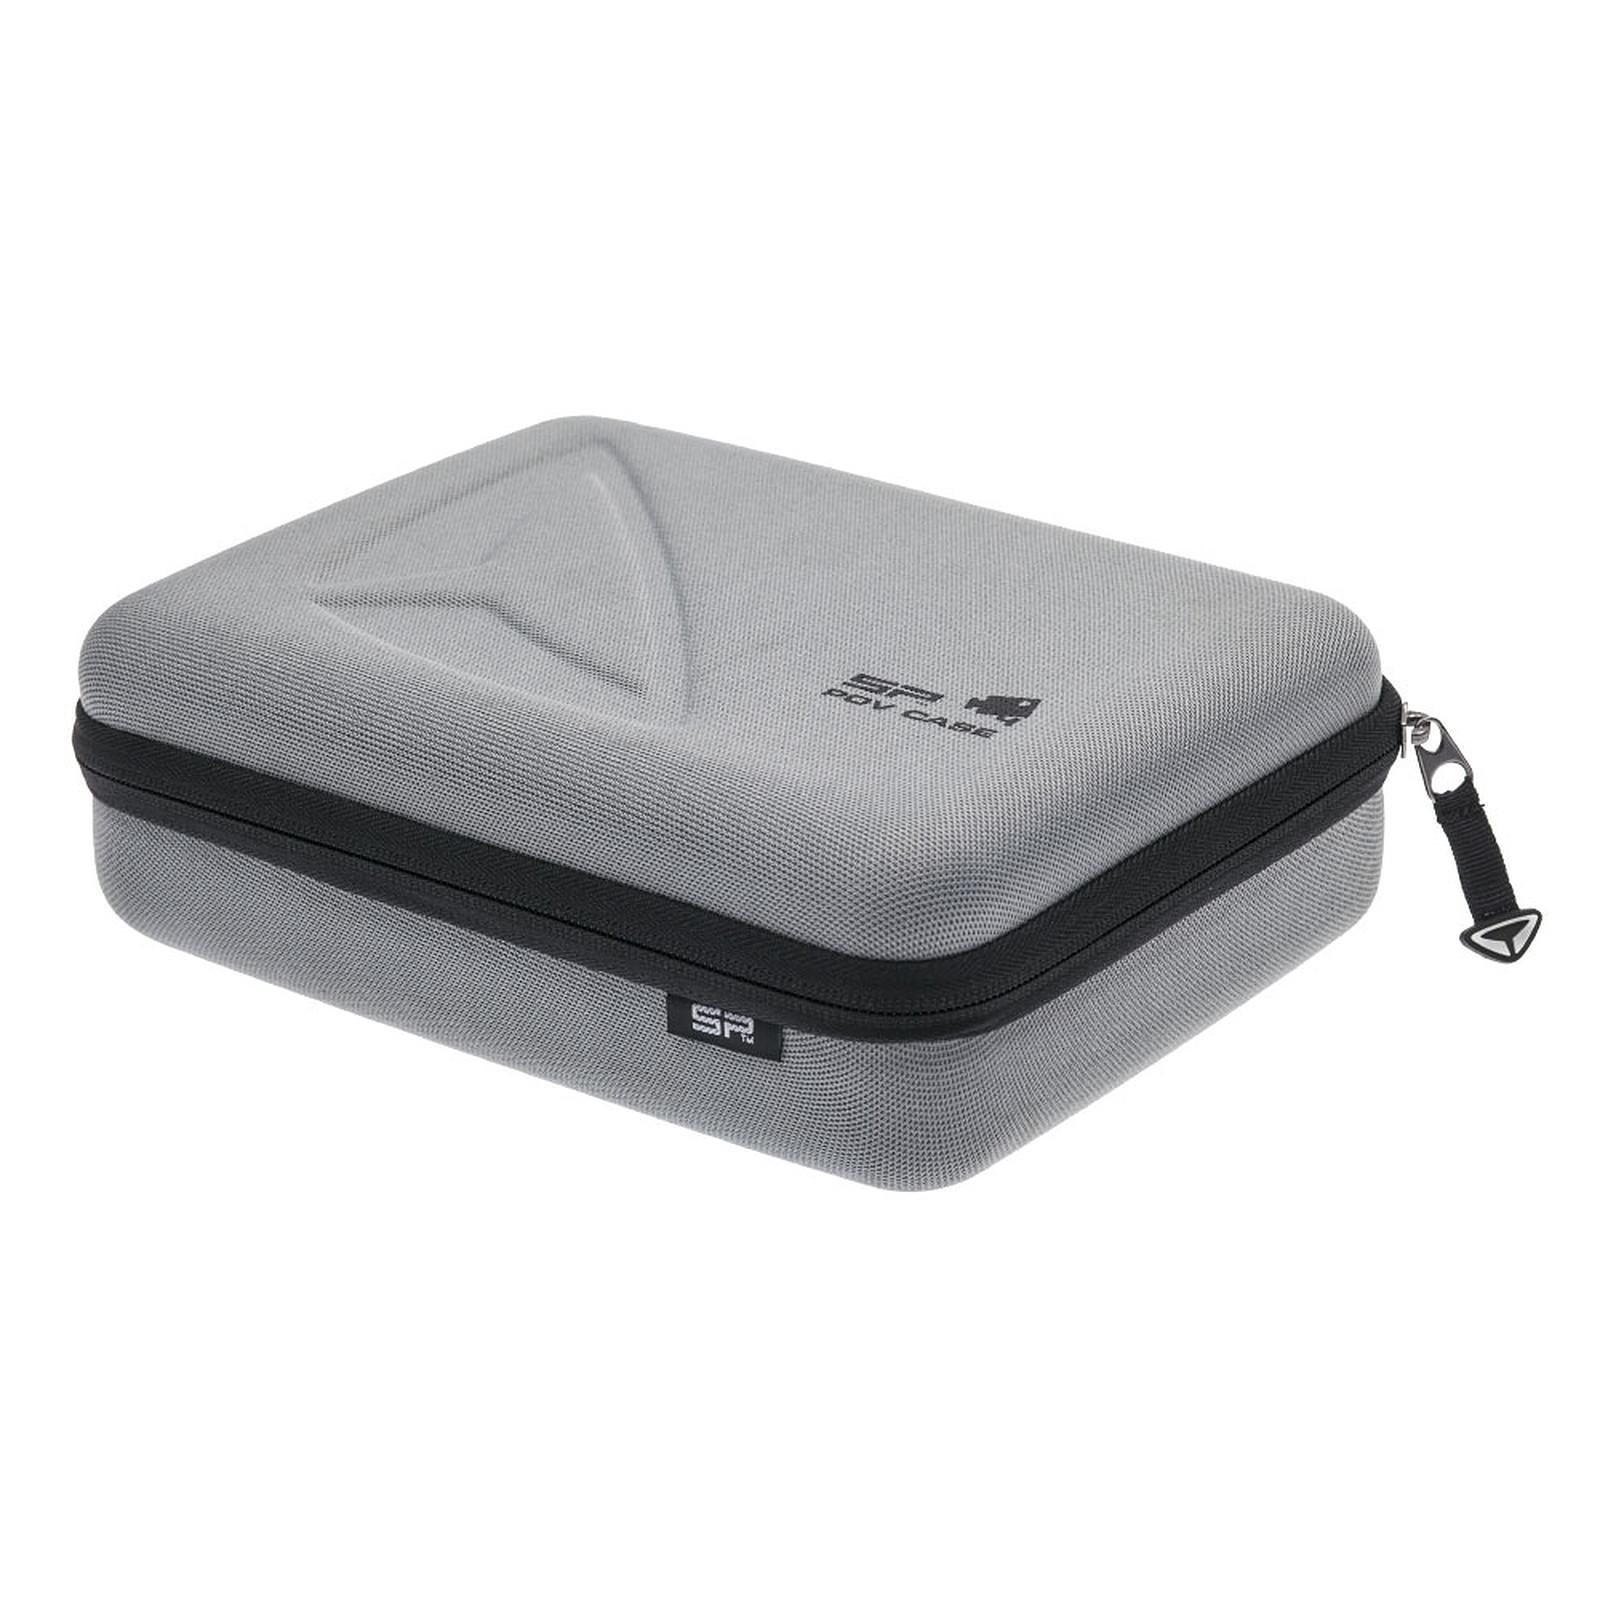 SP Pov Case Small GoPro Edition Gris